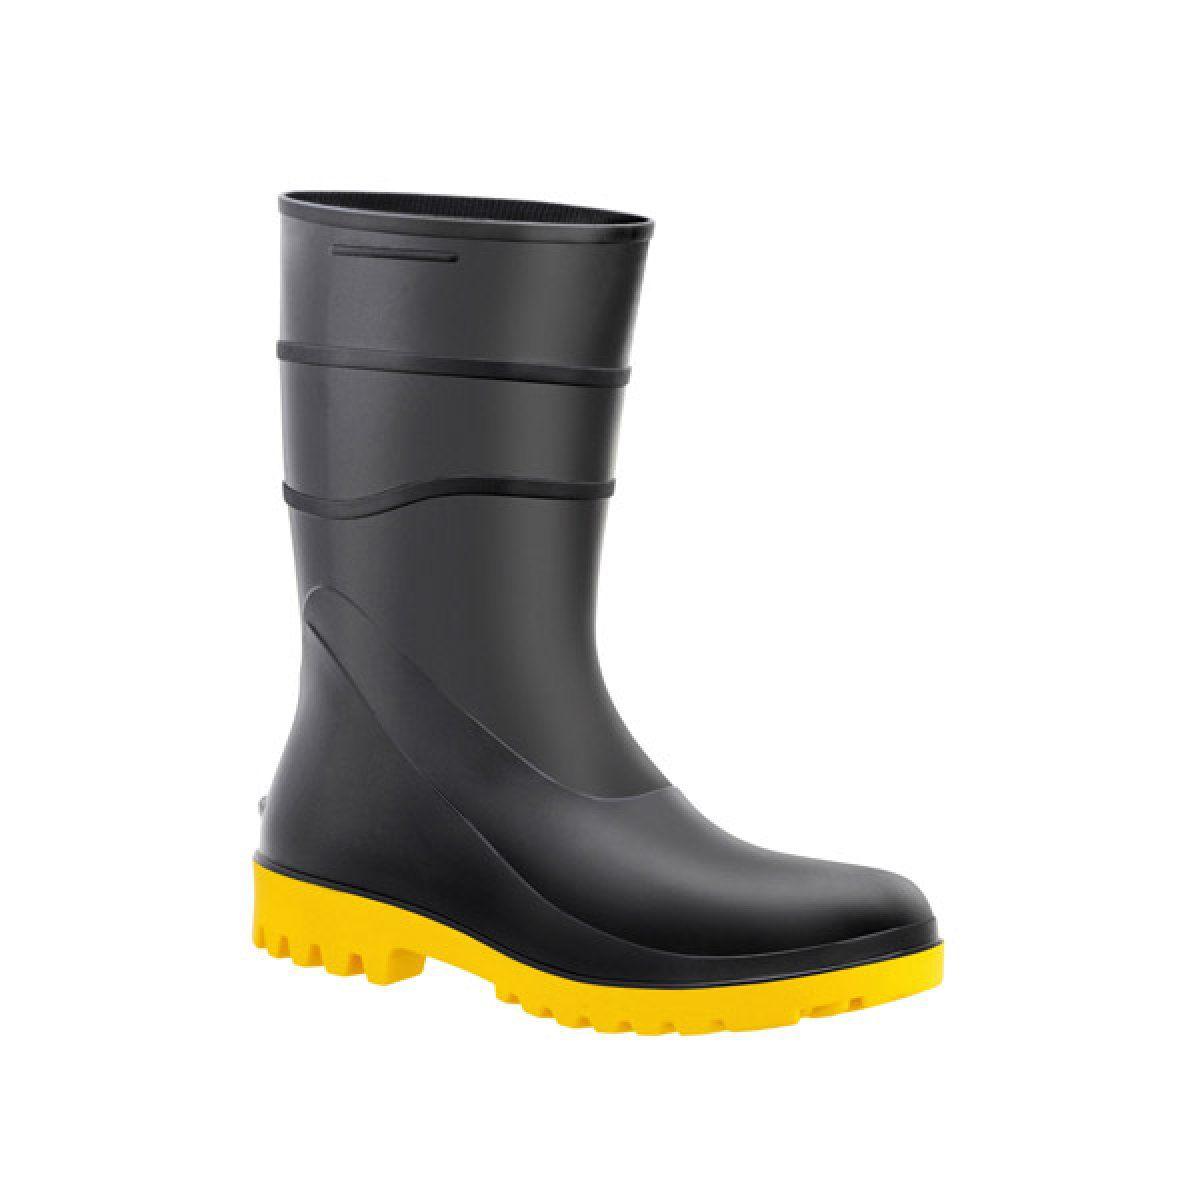 Bota de PVC Preta c/ Solado Amarelo N°45 - BRACOL